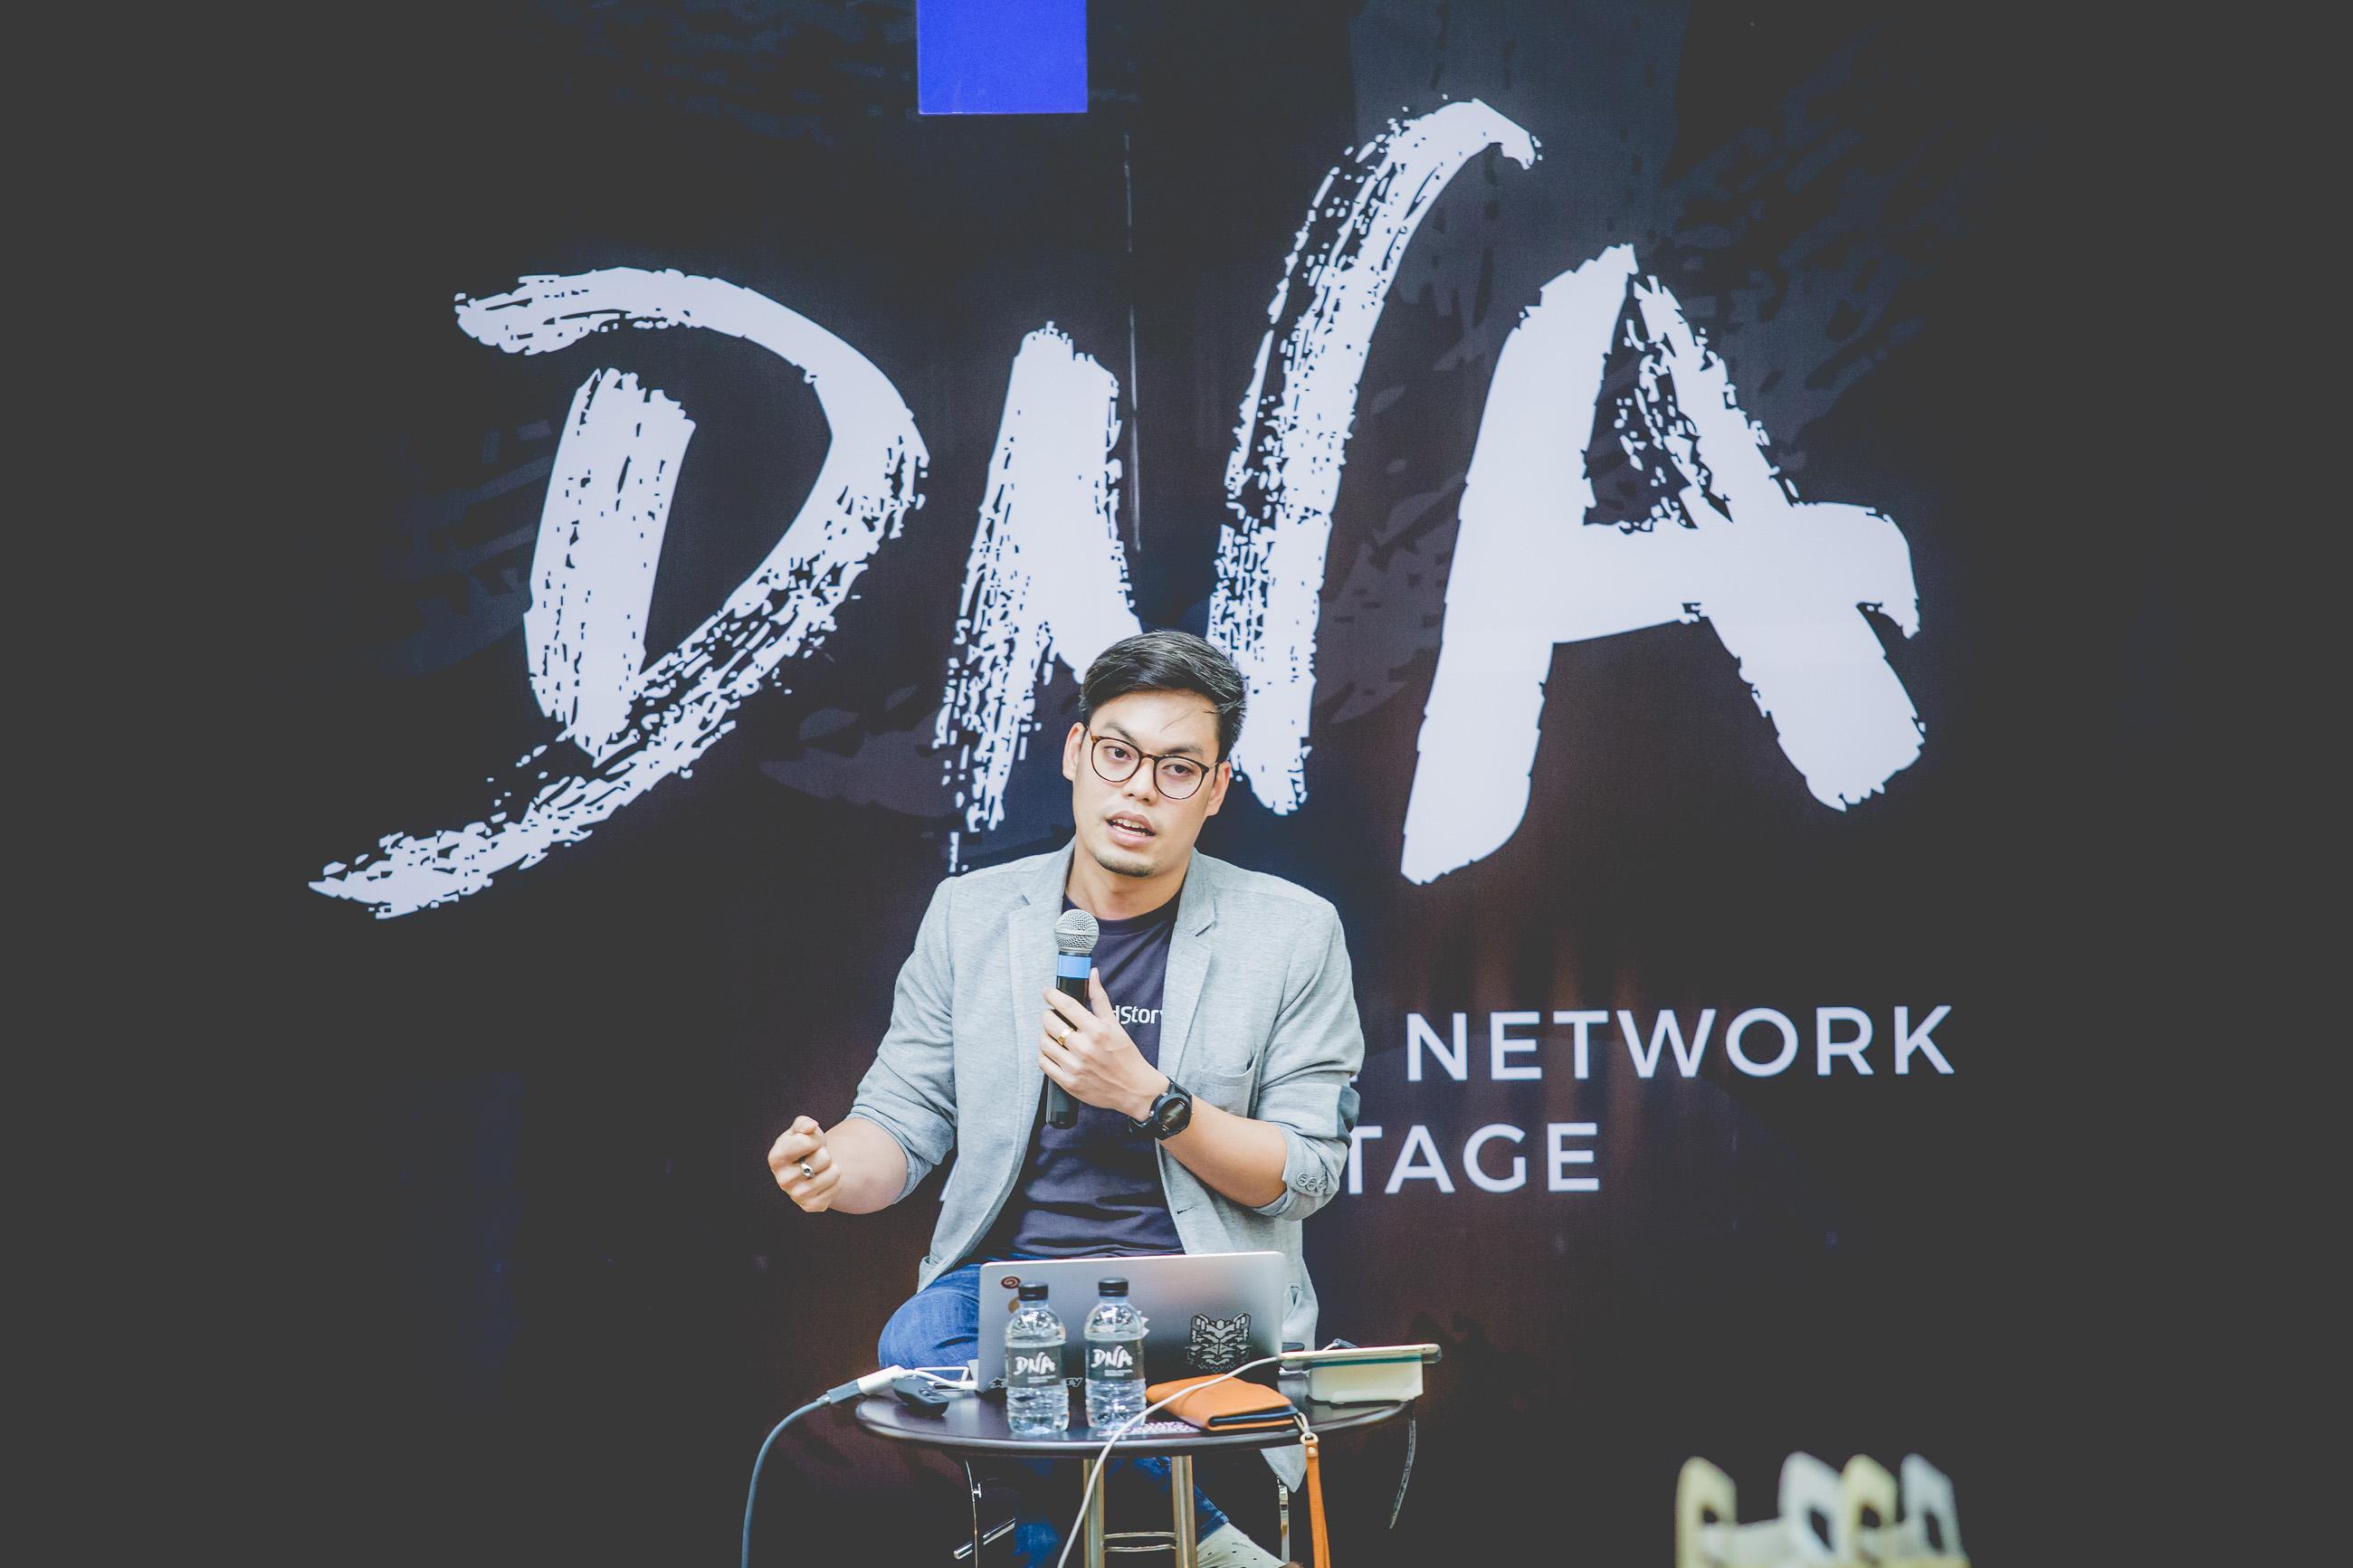 #DNAjournal EP.17 #DNAbySPU [Awaken the giant within :: ปลุกยักษ์ใหญ่…ที่อยู่ในธุรกิจ] คุณแจ็ค ชวิน ศุภวงศ์ Co-founder and COO, FoodStory